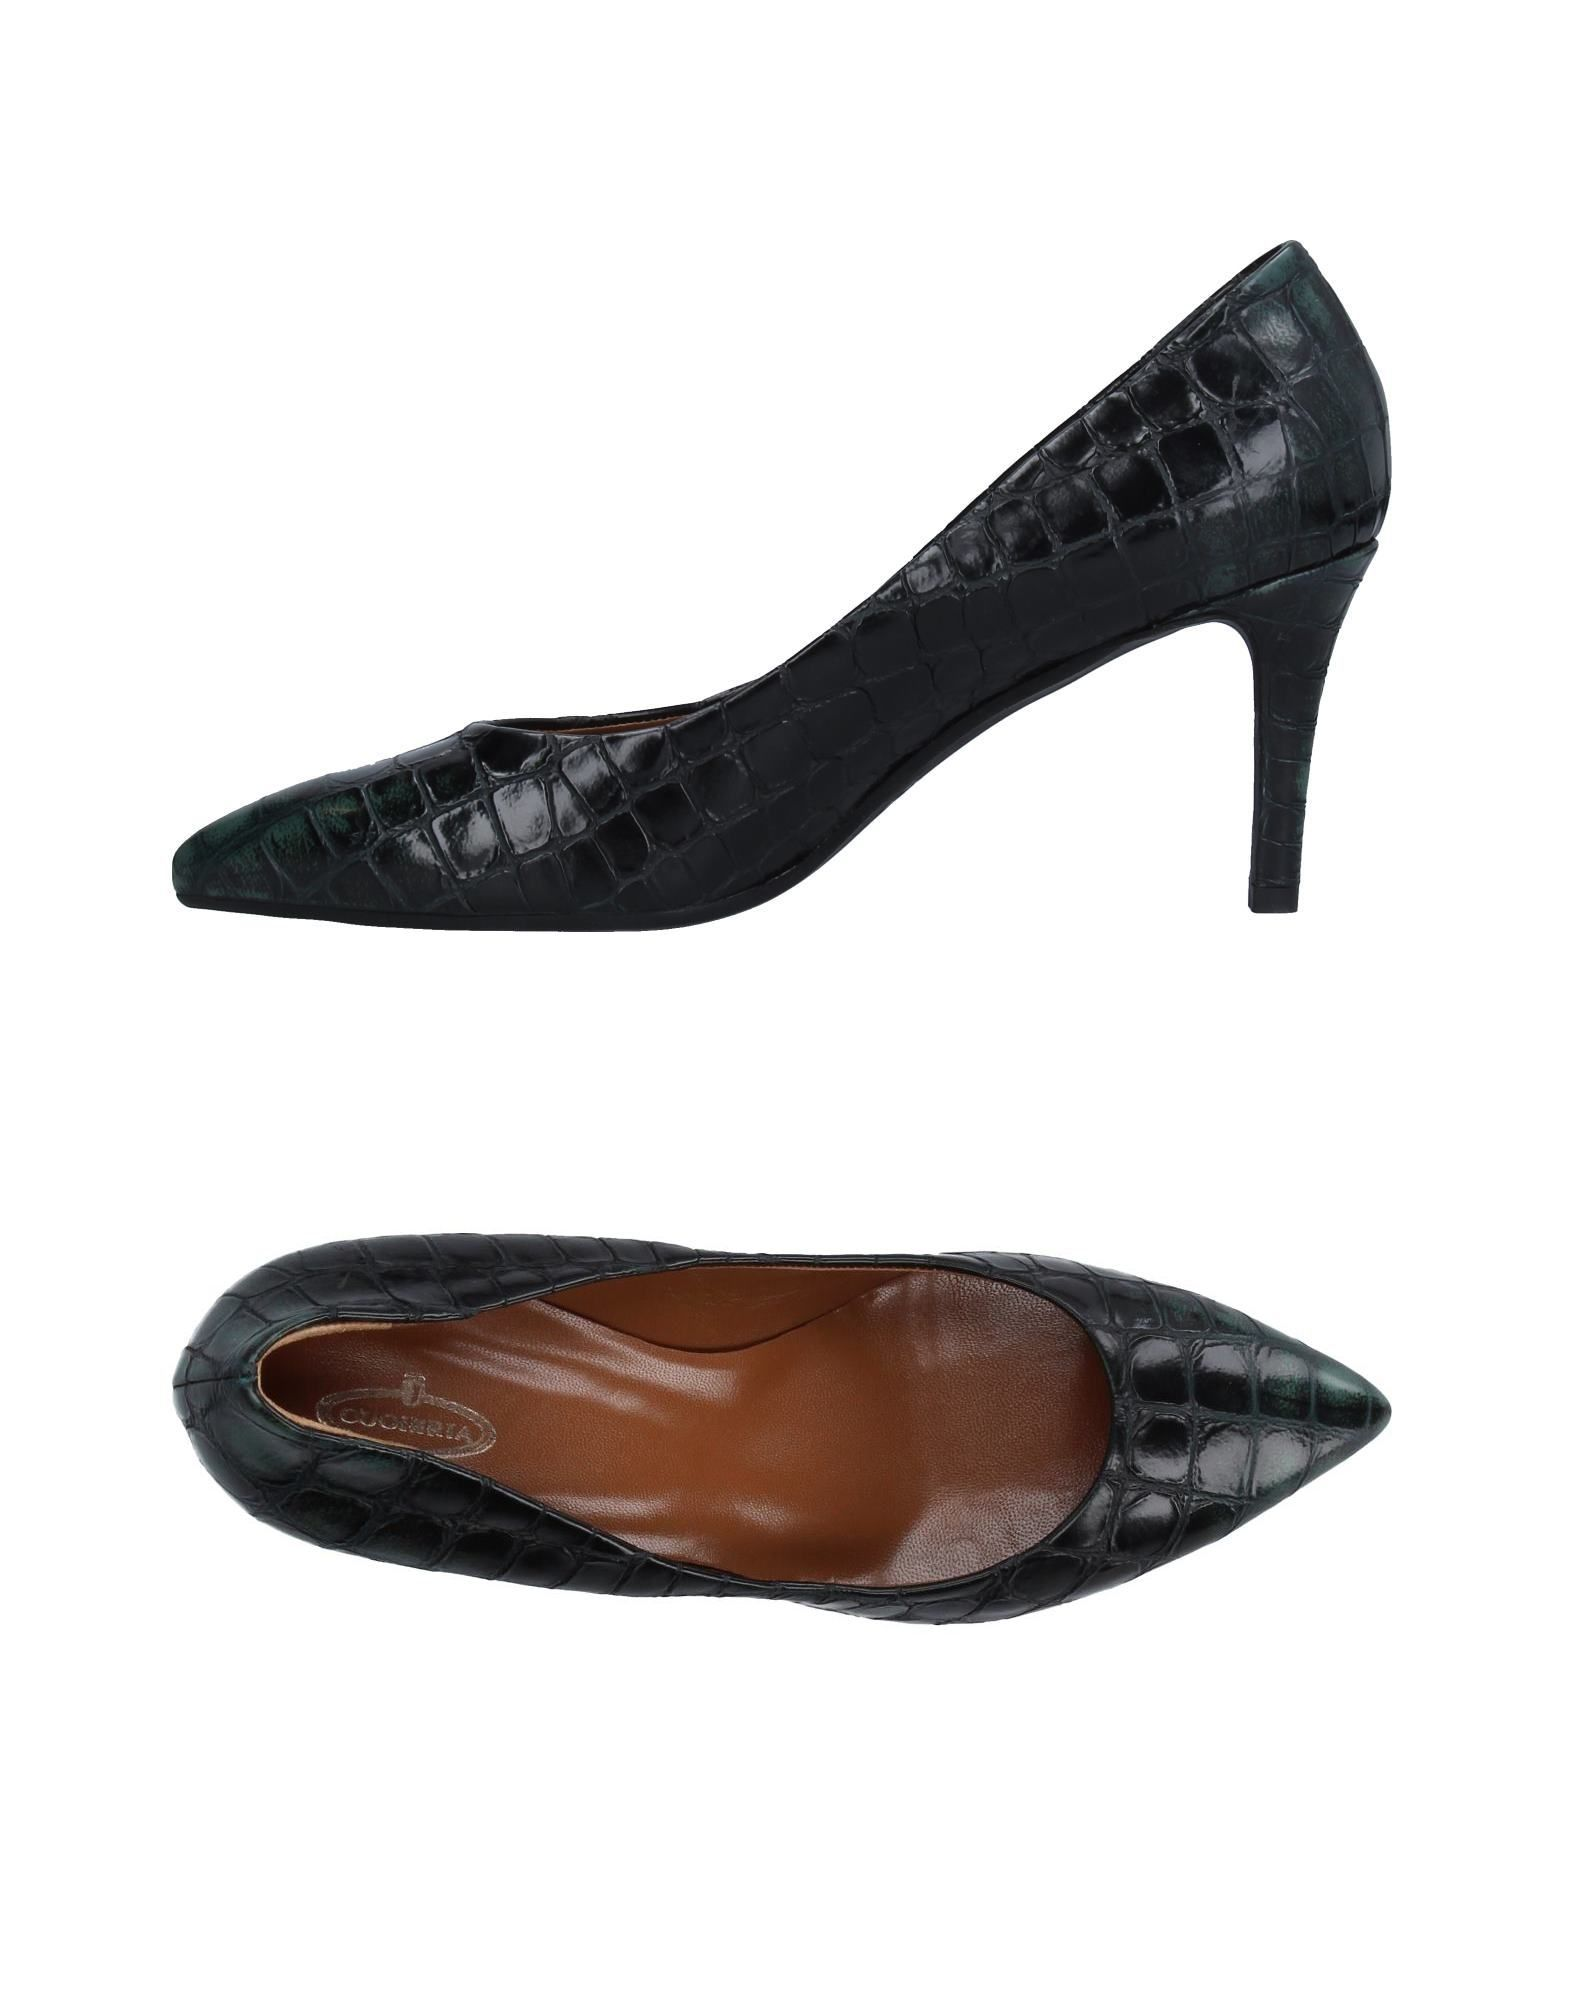 Mocassino Carrano Donna e - 11268468TO Nuove offerte e Donna scarpe comode 5ed787